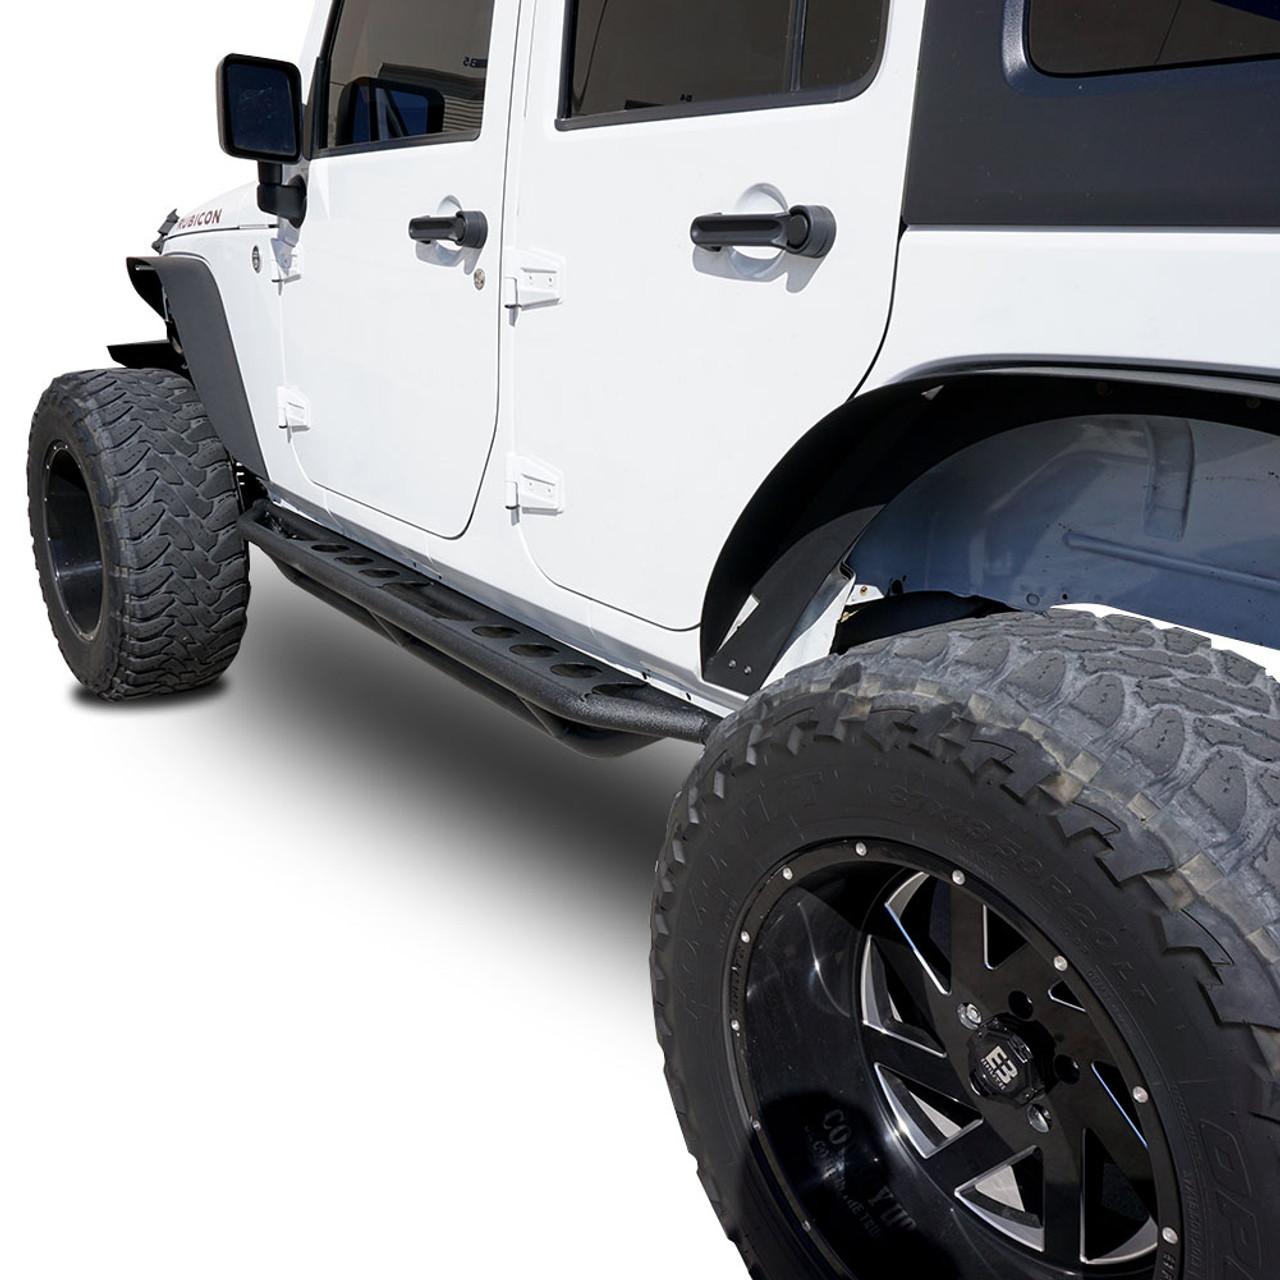 Jeep Wrangler Top View >> Running Boards Side Steps Rail Steps Rock Sliders 2007-2018 Jeep Wrangler 4dr - JEEPFEDERATION